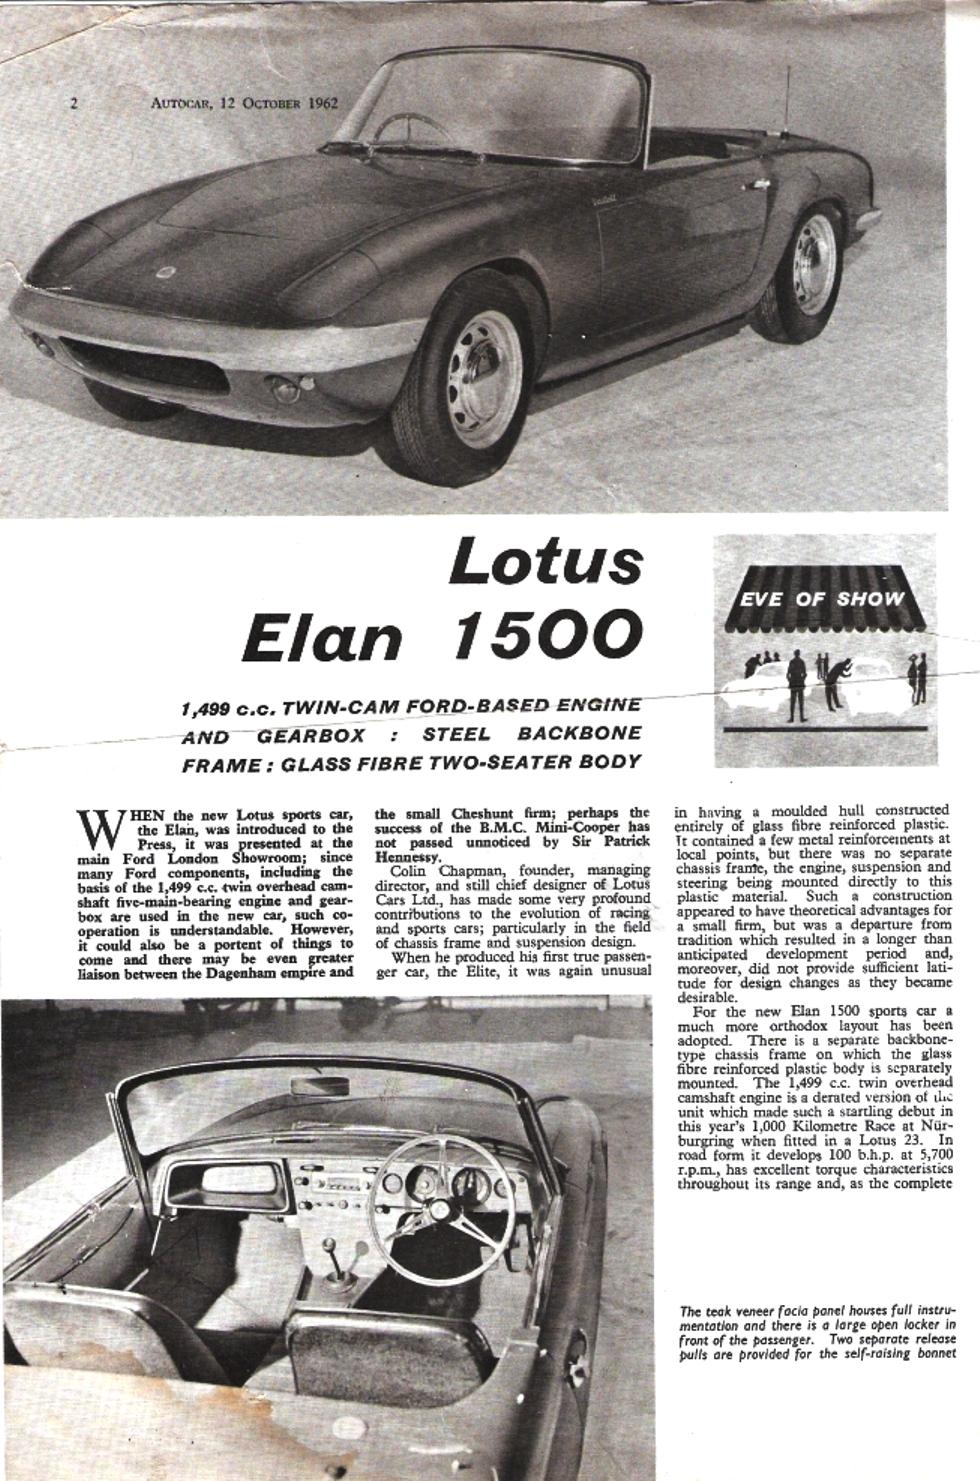 Elan Launch Autocar Oct 62 2